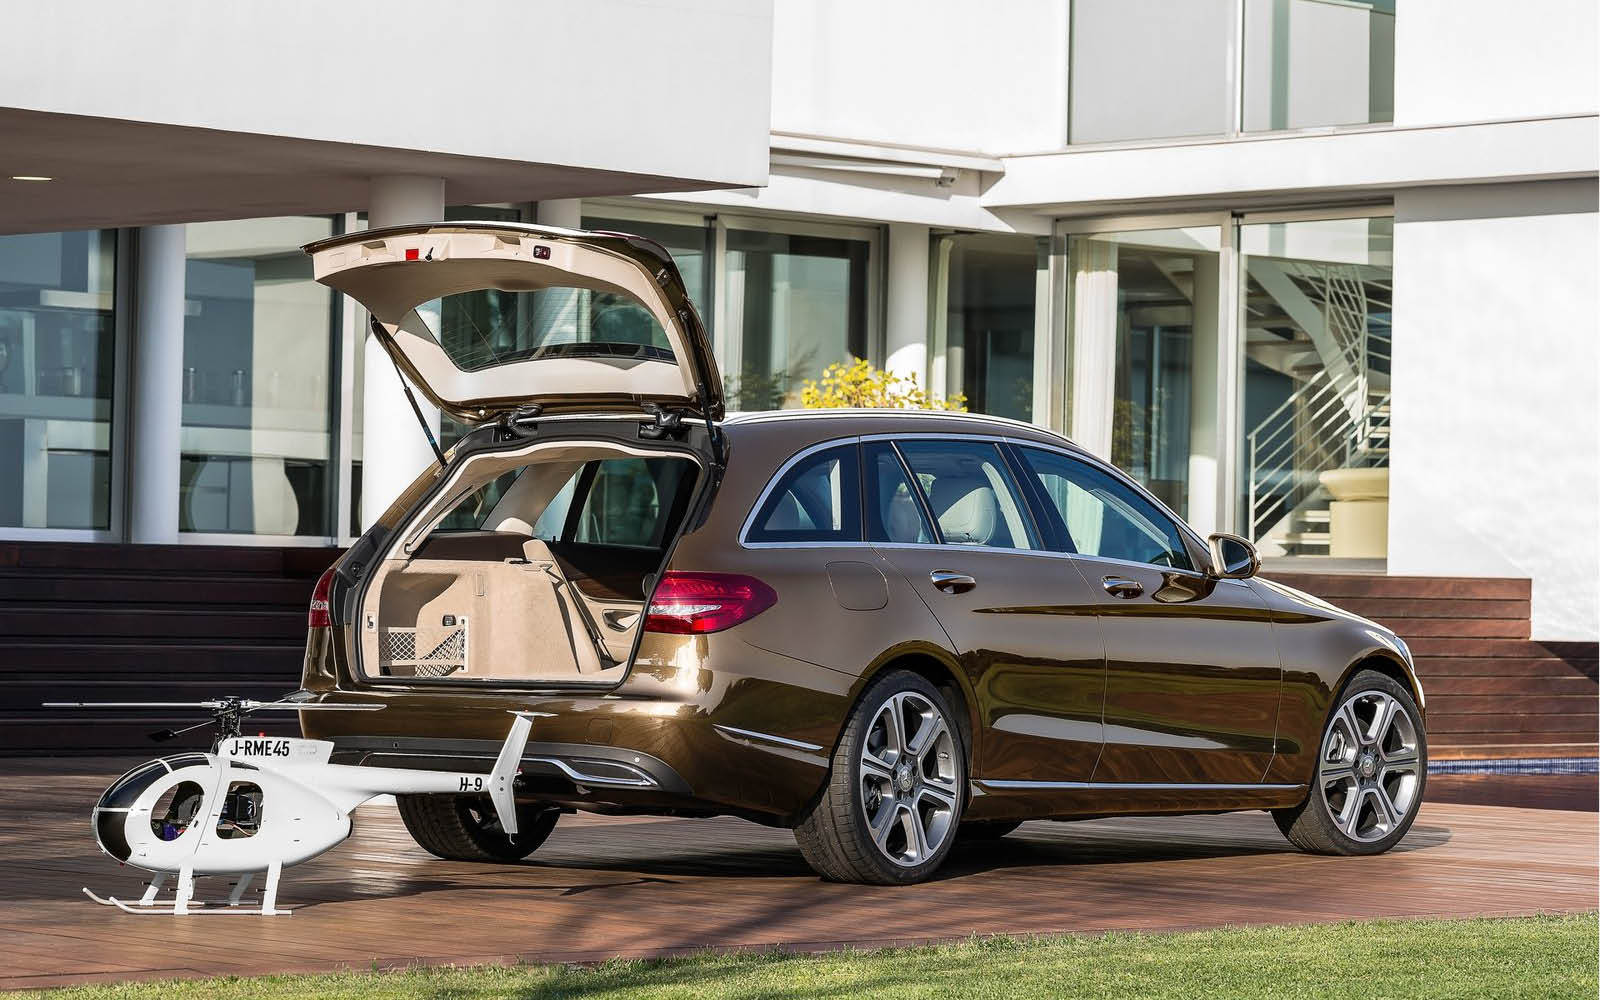 Mercedes benz clase c estate 21 30 for Mercedes benz clase c